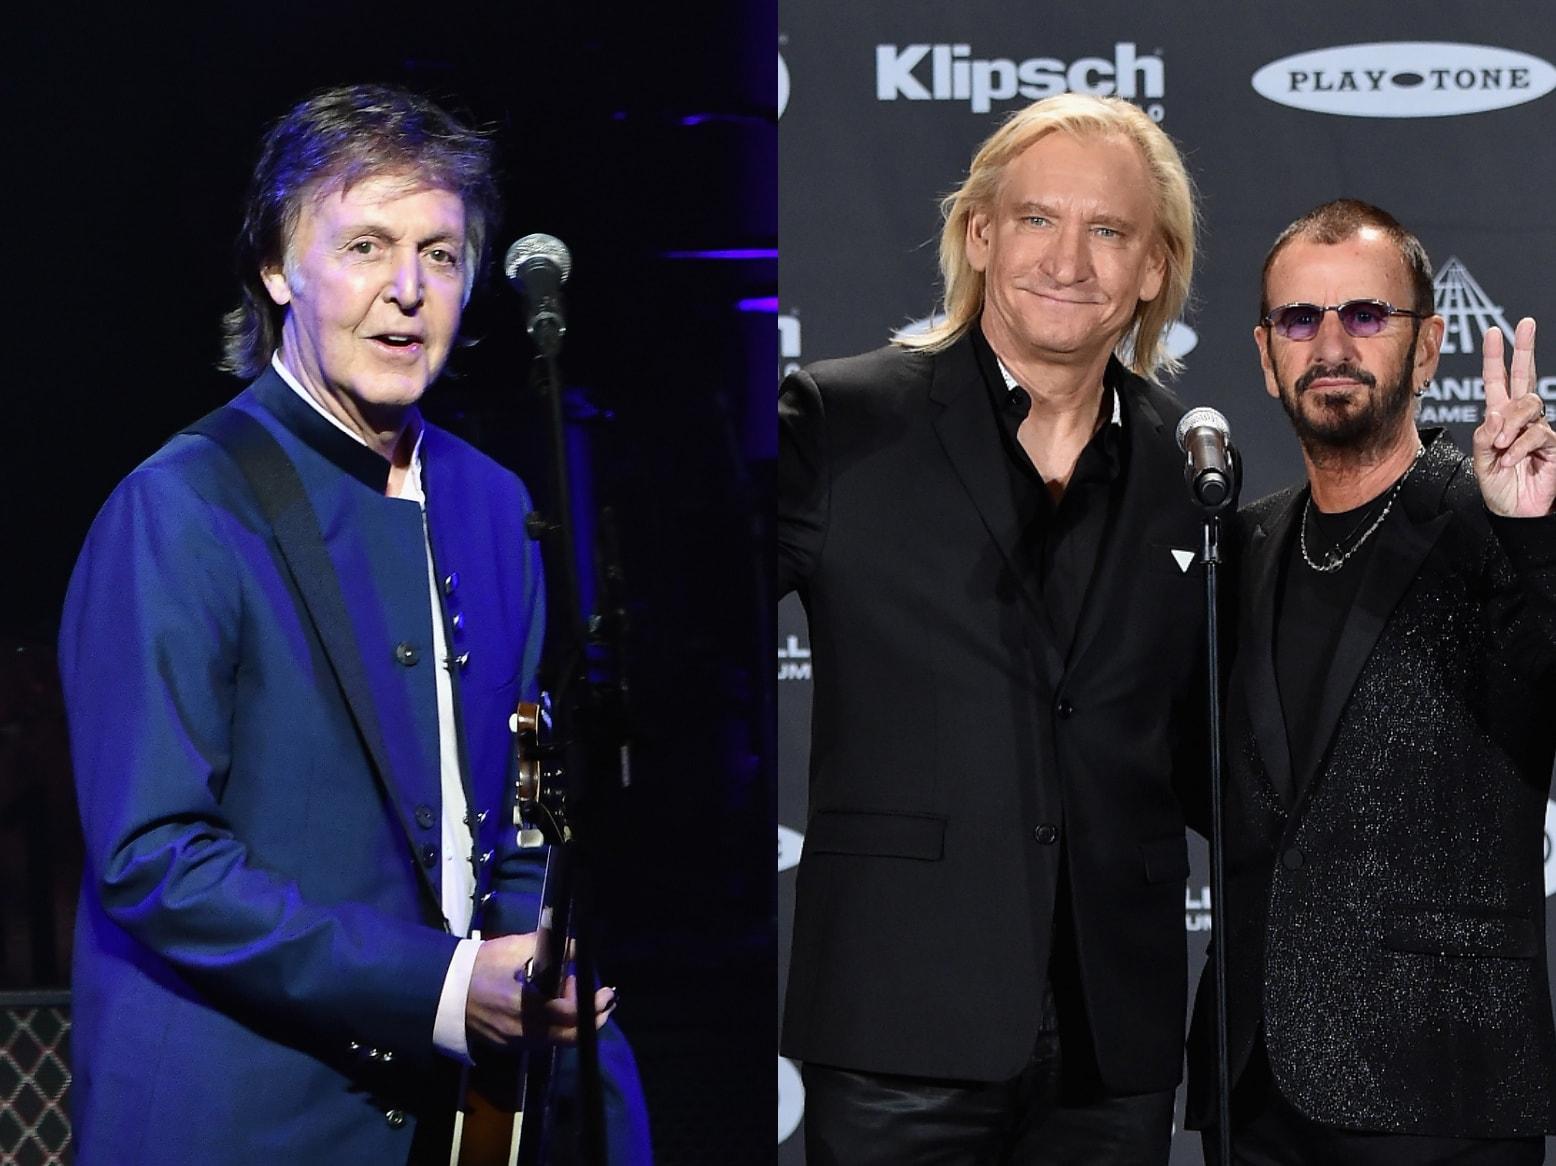 Paul Mccartney Joined By Ringo Starr Joe Walsh At Dodger